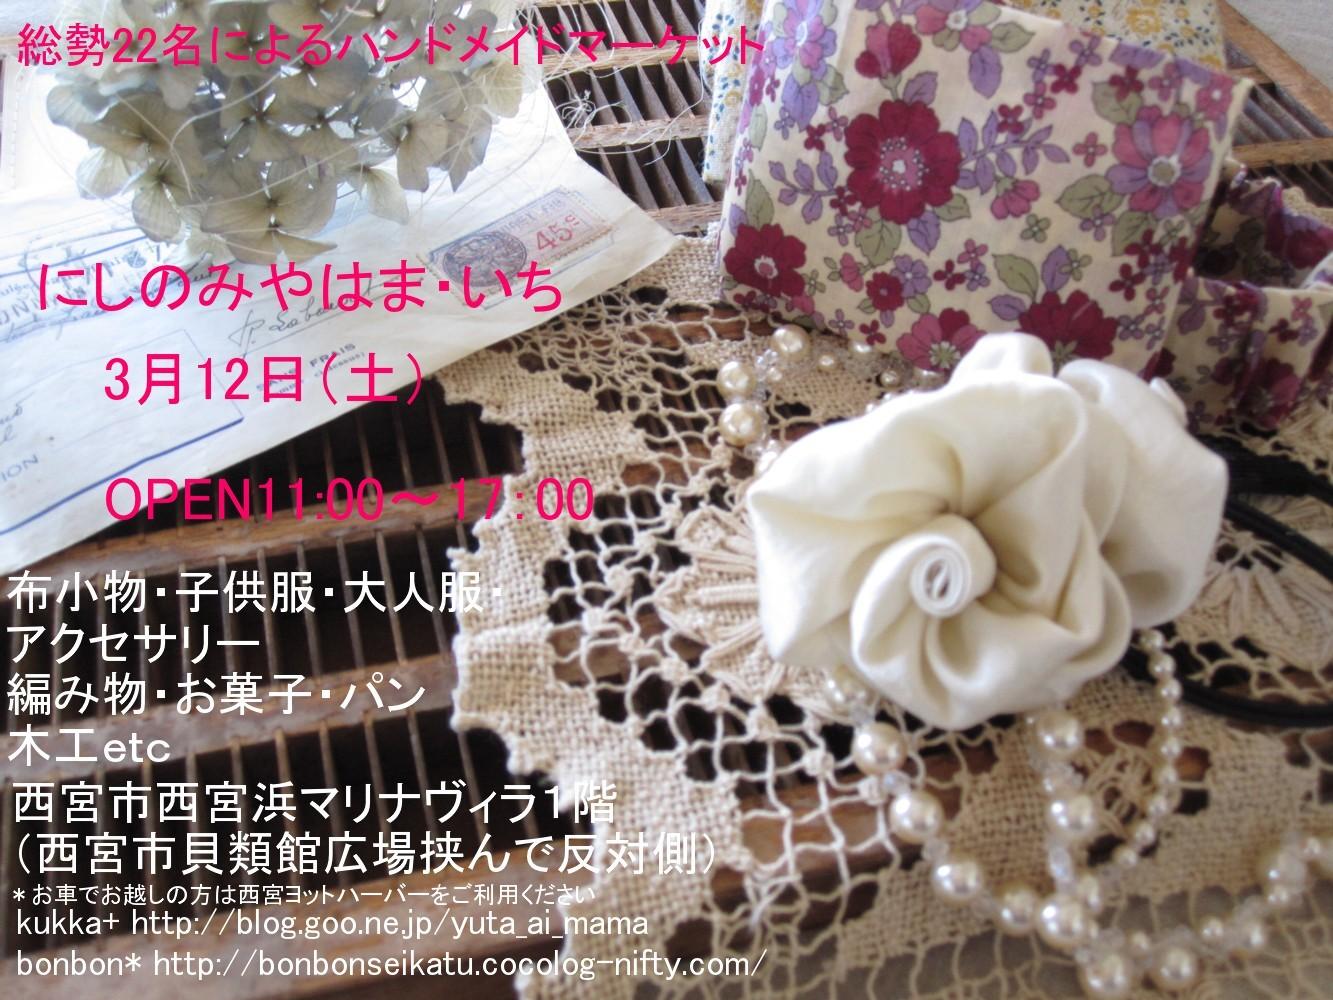 Img_1577201102212